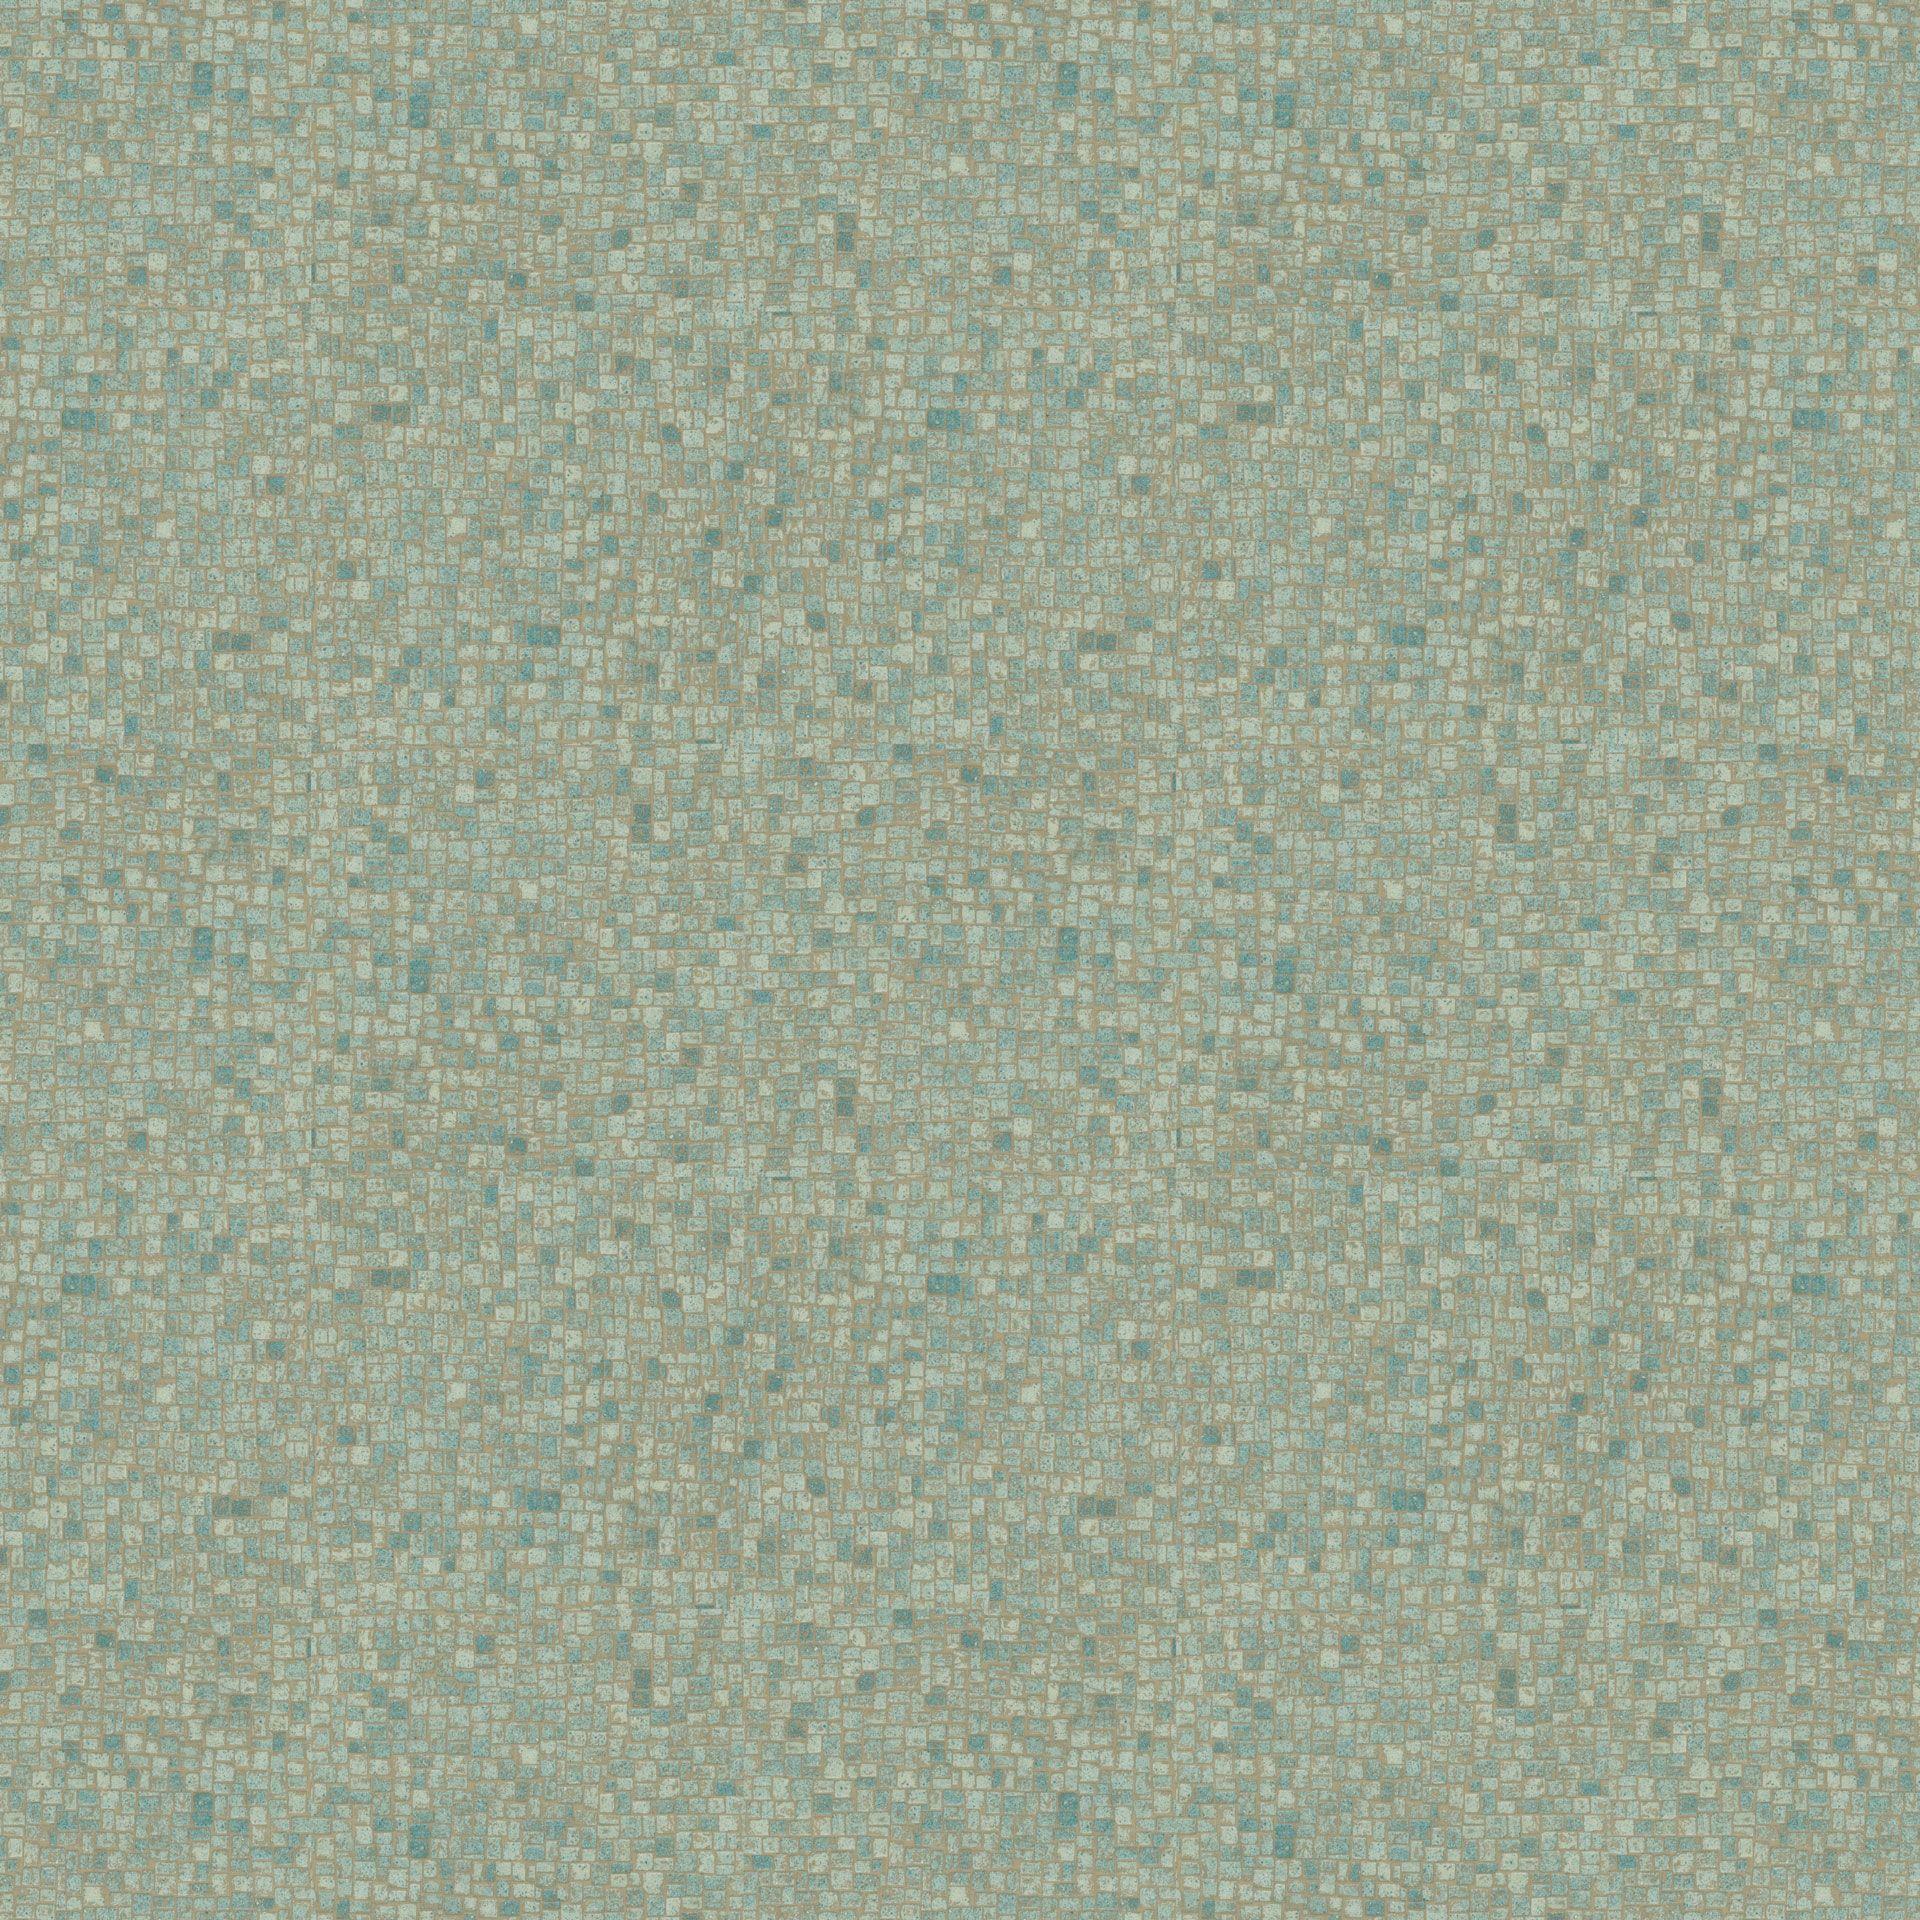 Natural Stone Effect Vinyl Flooring Realistic Stone Floors Floor Tiles Vinyl Flooring Luxury Vinyl Flooring Mosaic Flooring